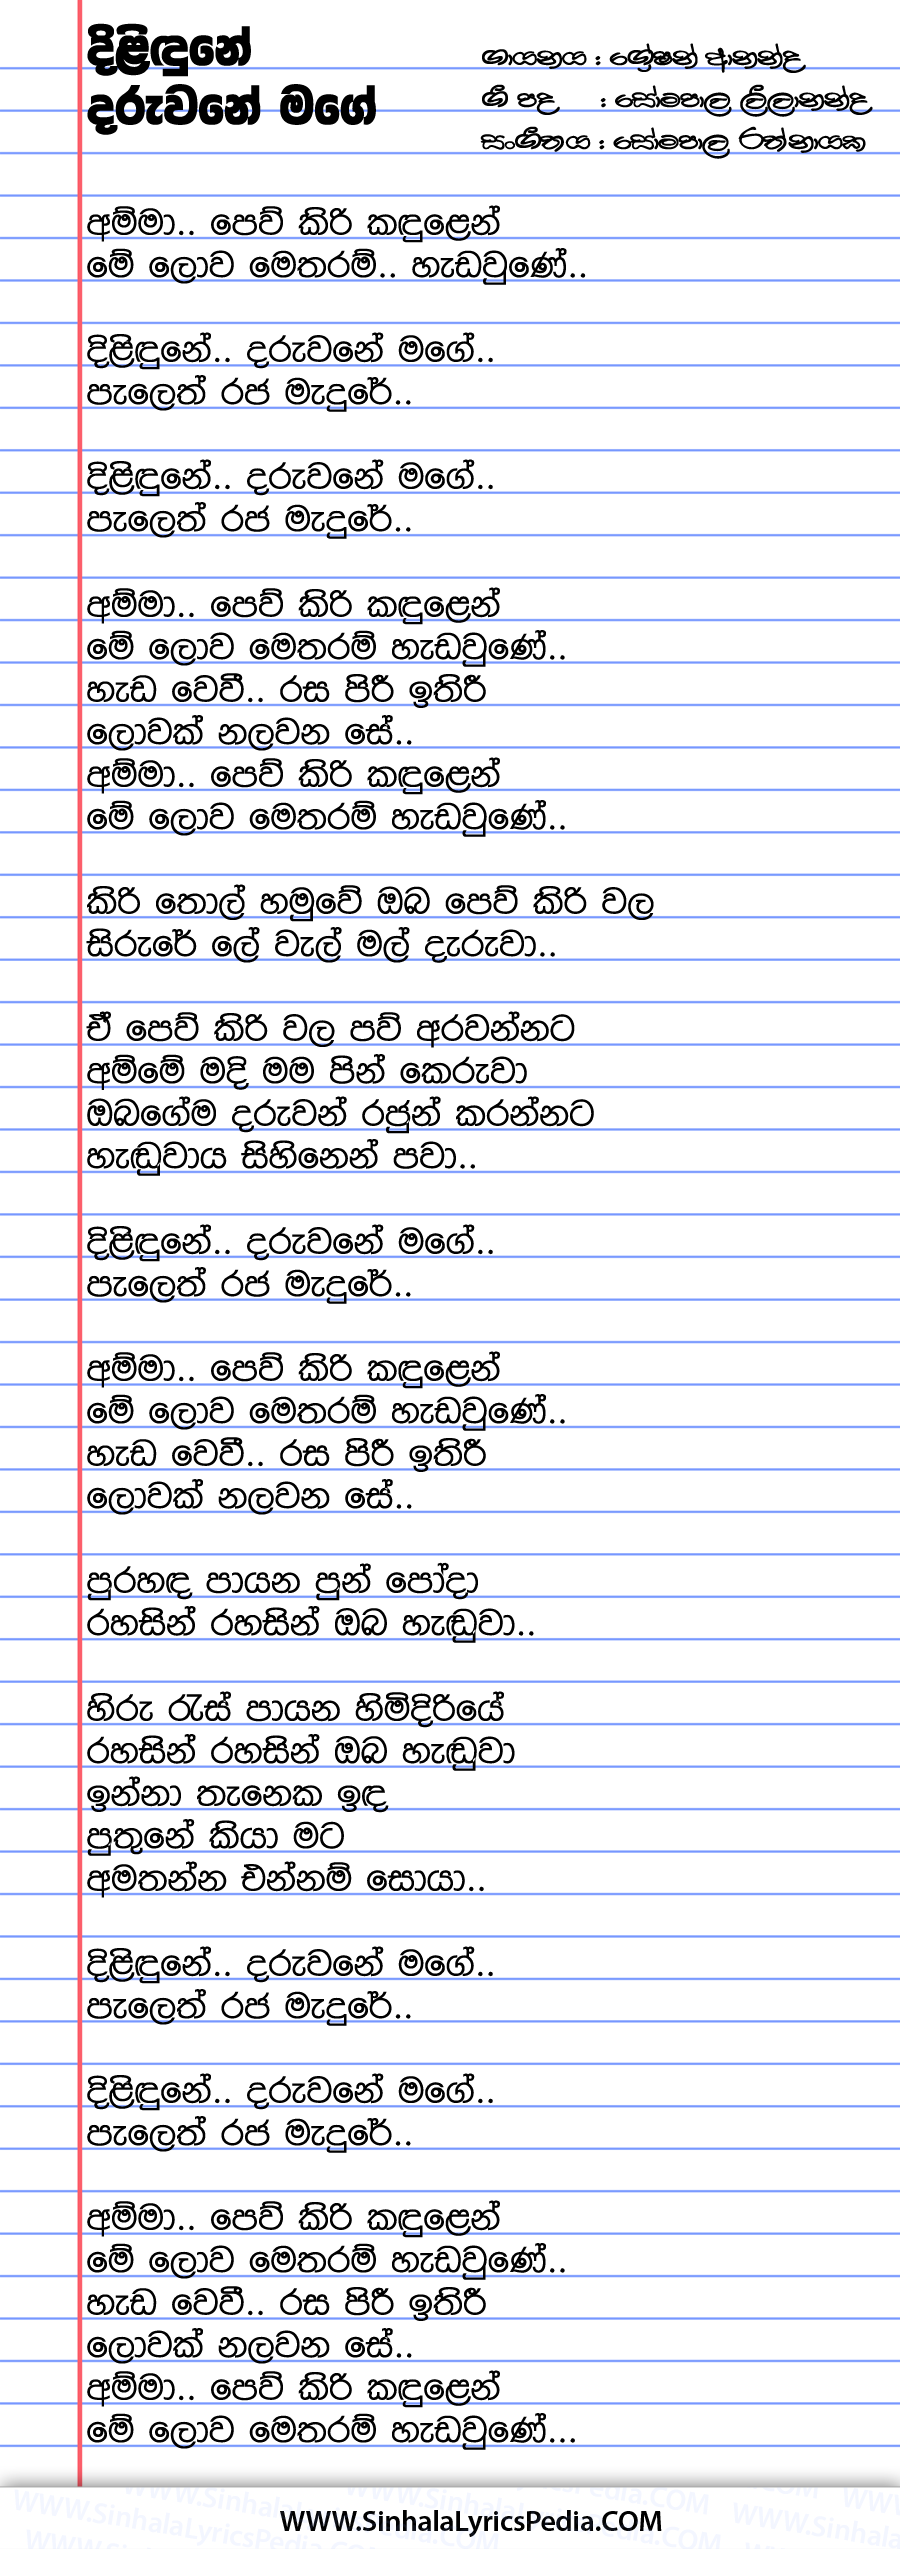 Dilidune Daruwane Mage Song Lyrics